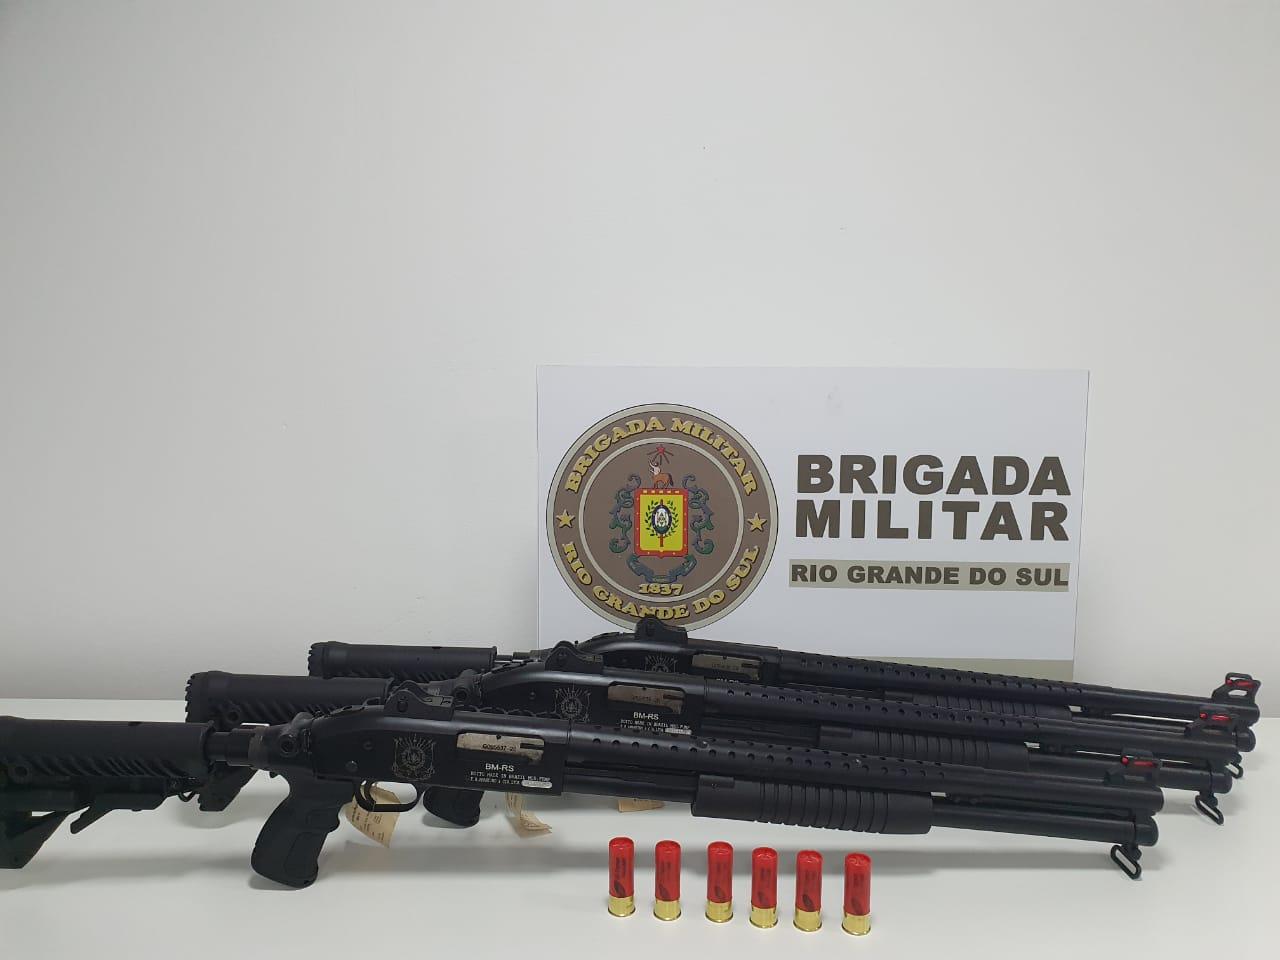 BM de Estrela Velha recebe carabina calibre 12